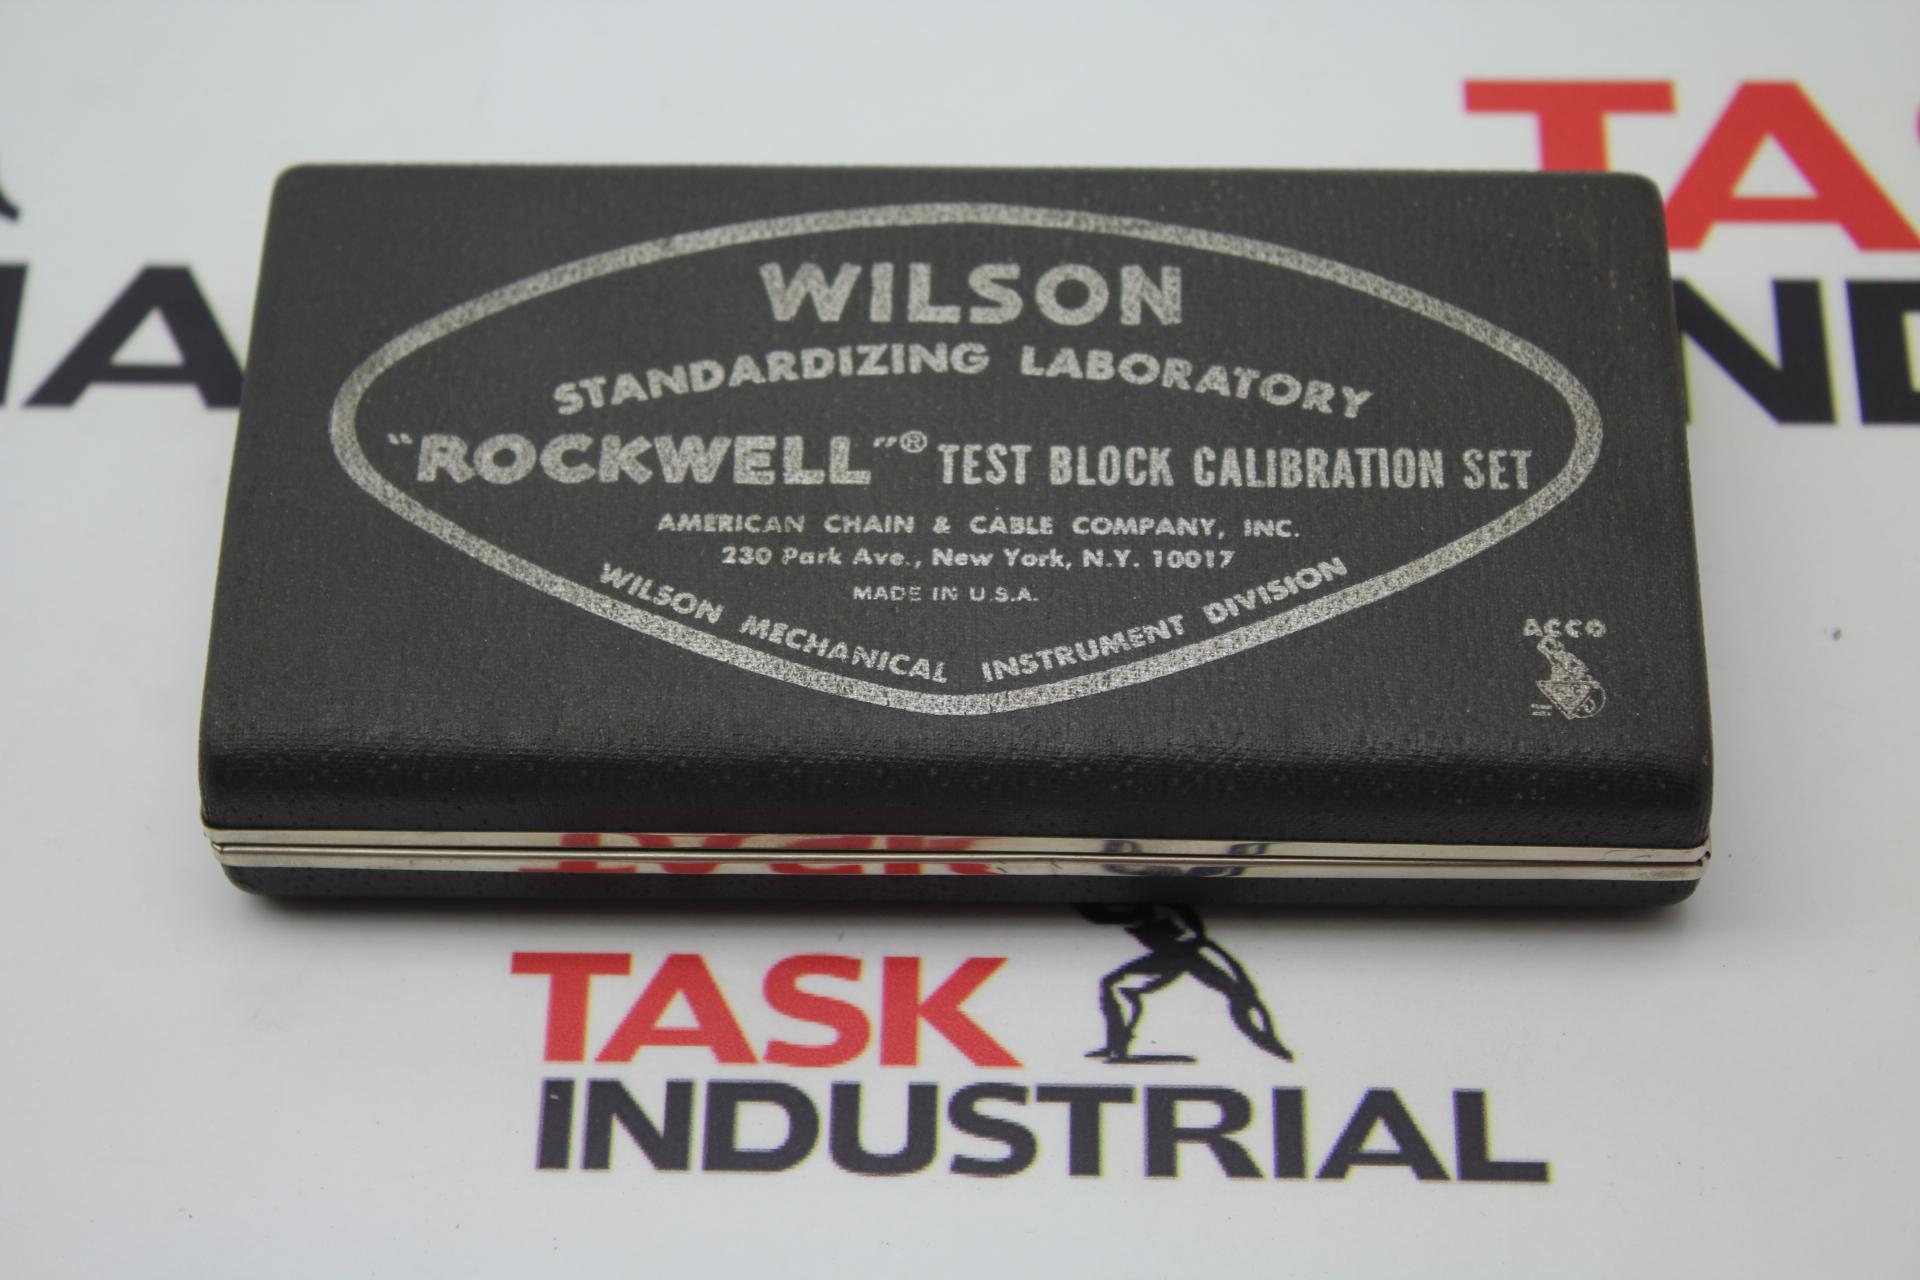 "Wilson ""ROCKWELL"" Test Block Calibration Set"